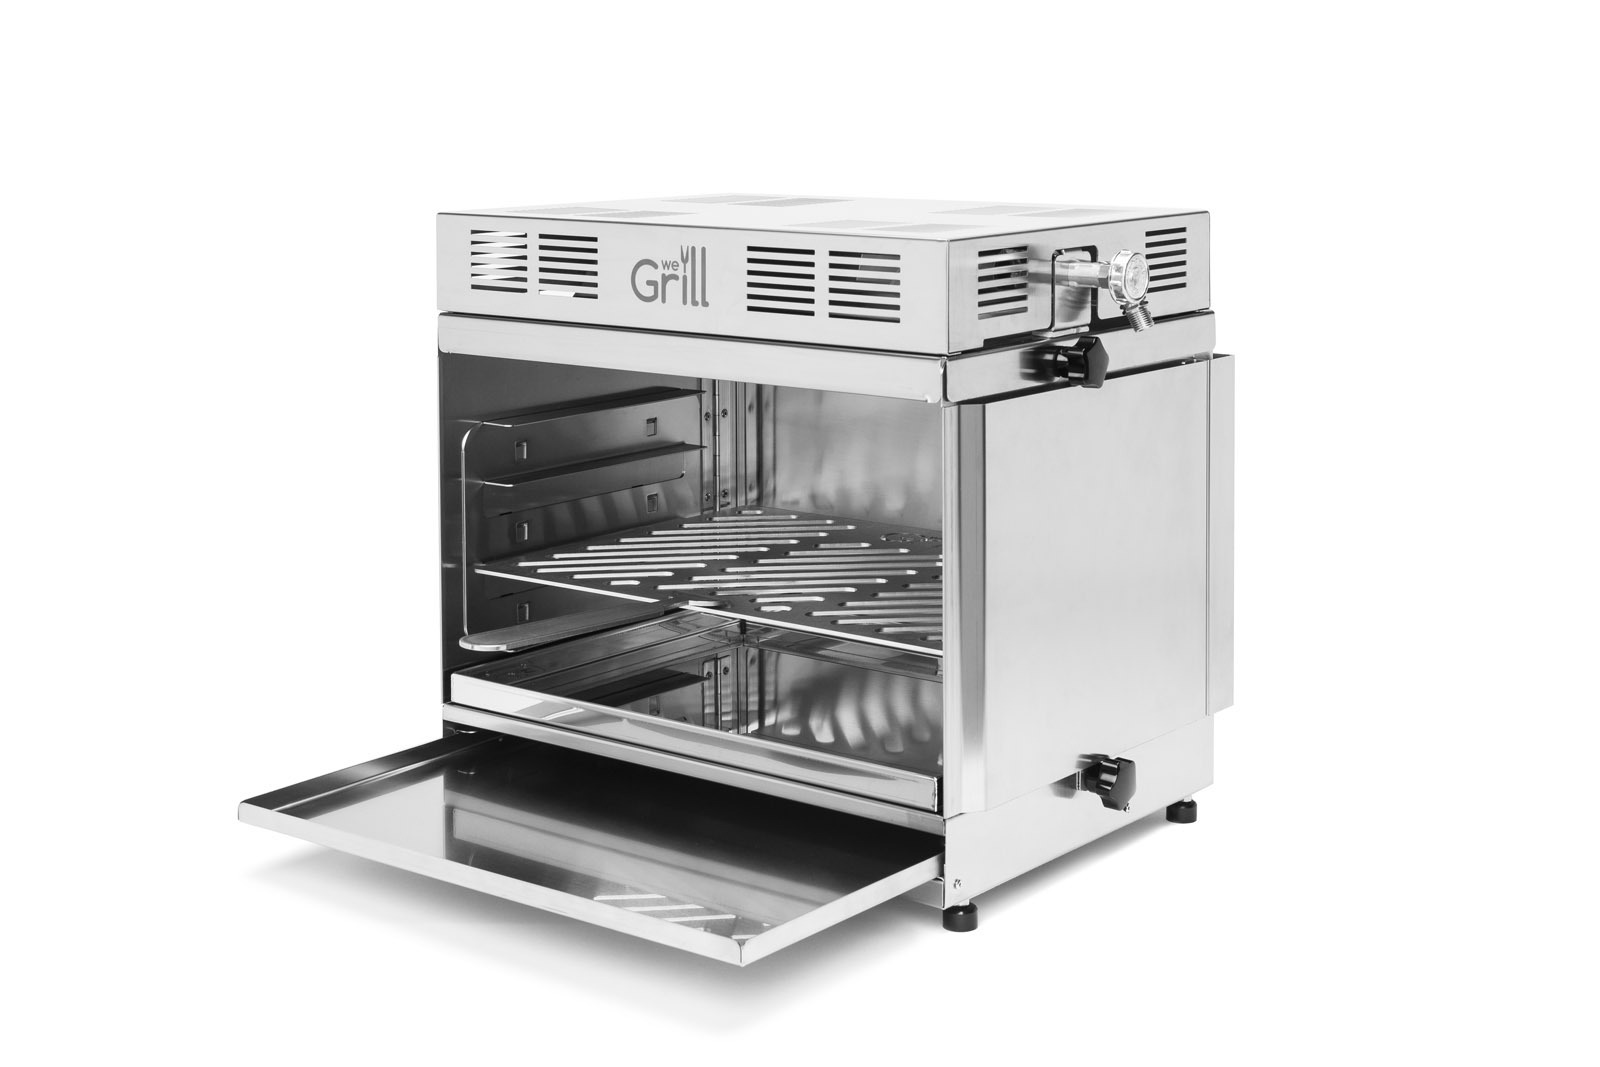 wegrill folding 850 grad steak infrarot grill grillarena. Black Bedroom Furniture Sets. Home Design Ideas